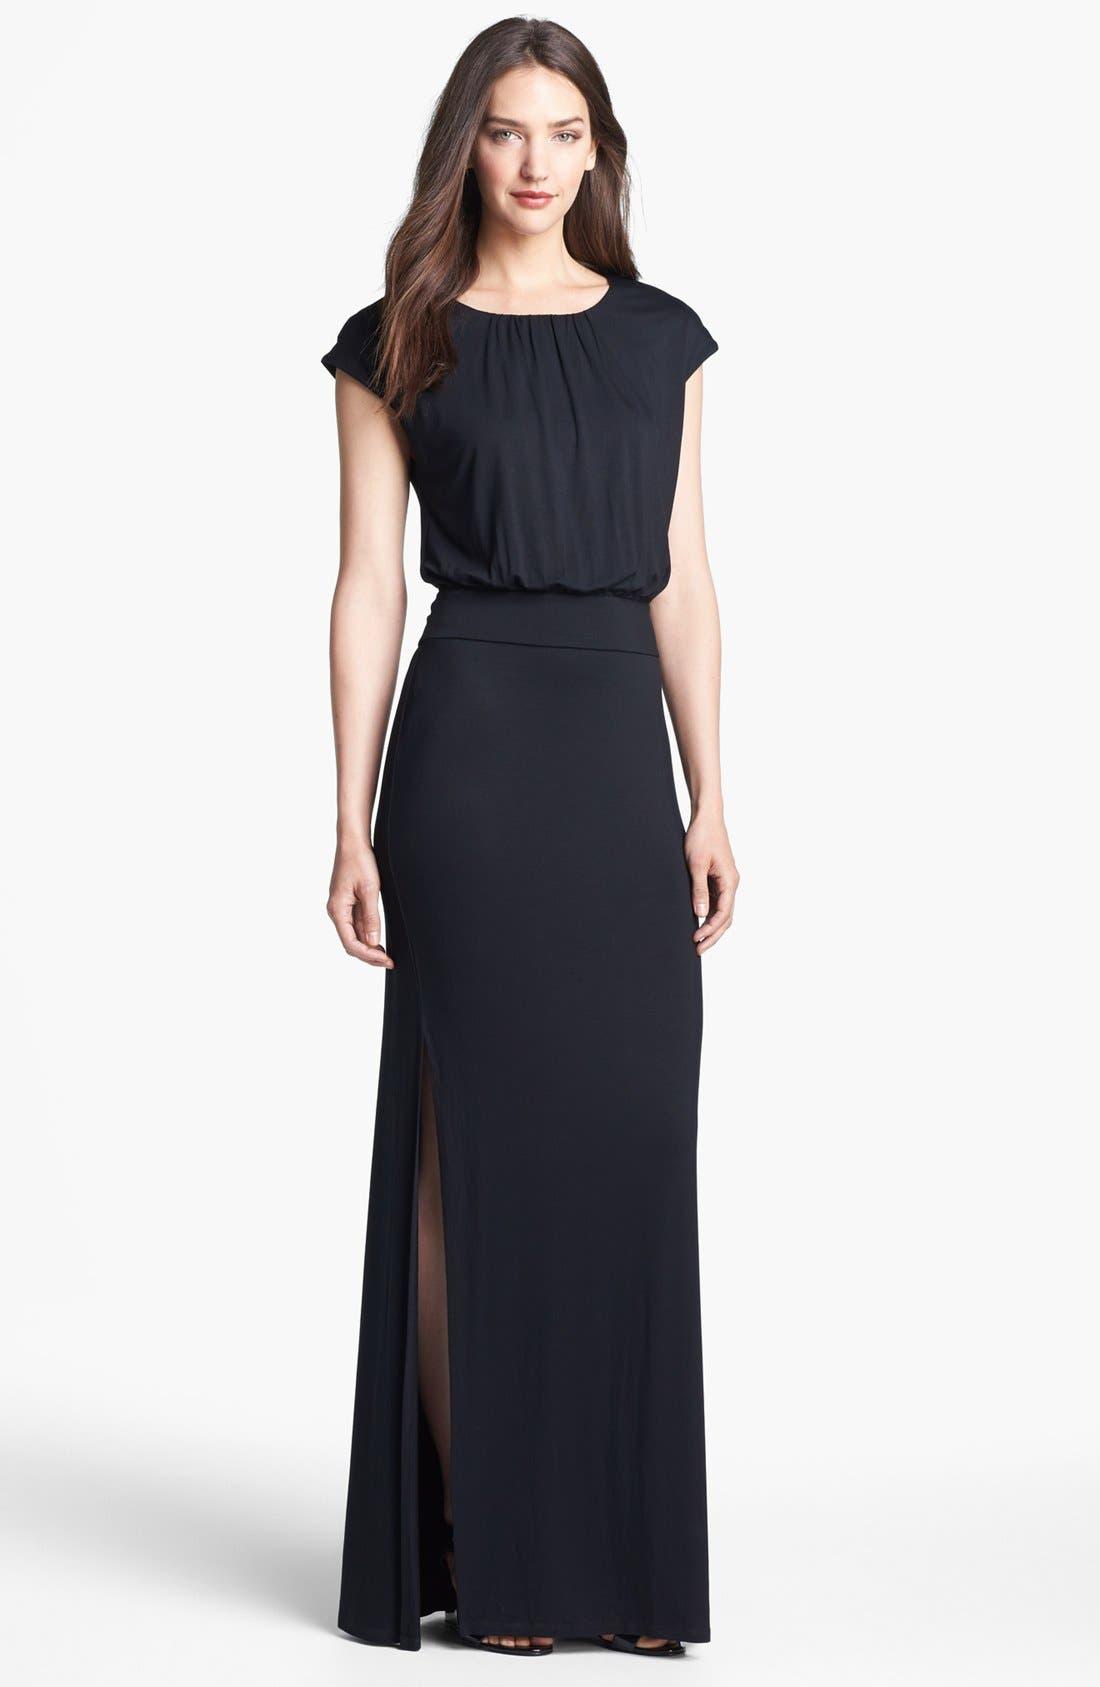 Main Image - Felicity & Coco 'Vienna' Blouson Maxi Dress (Nordstrom Exclusive)